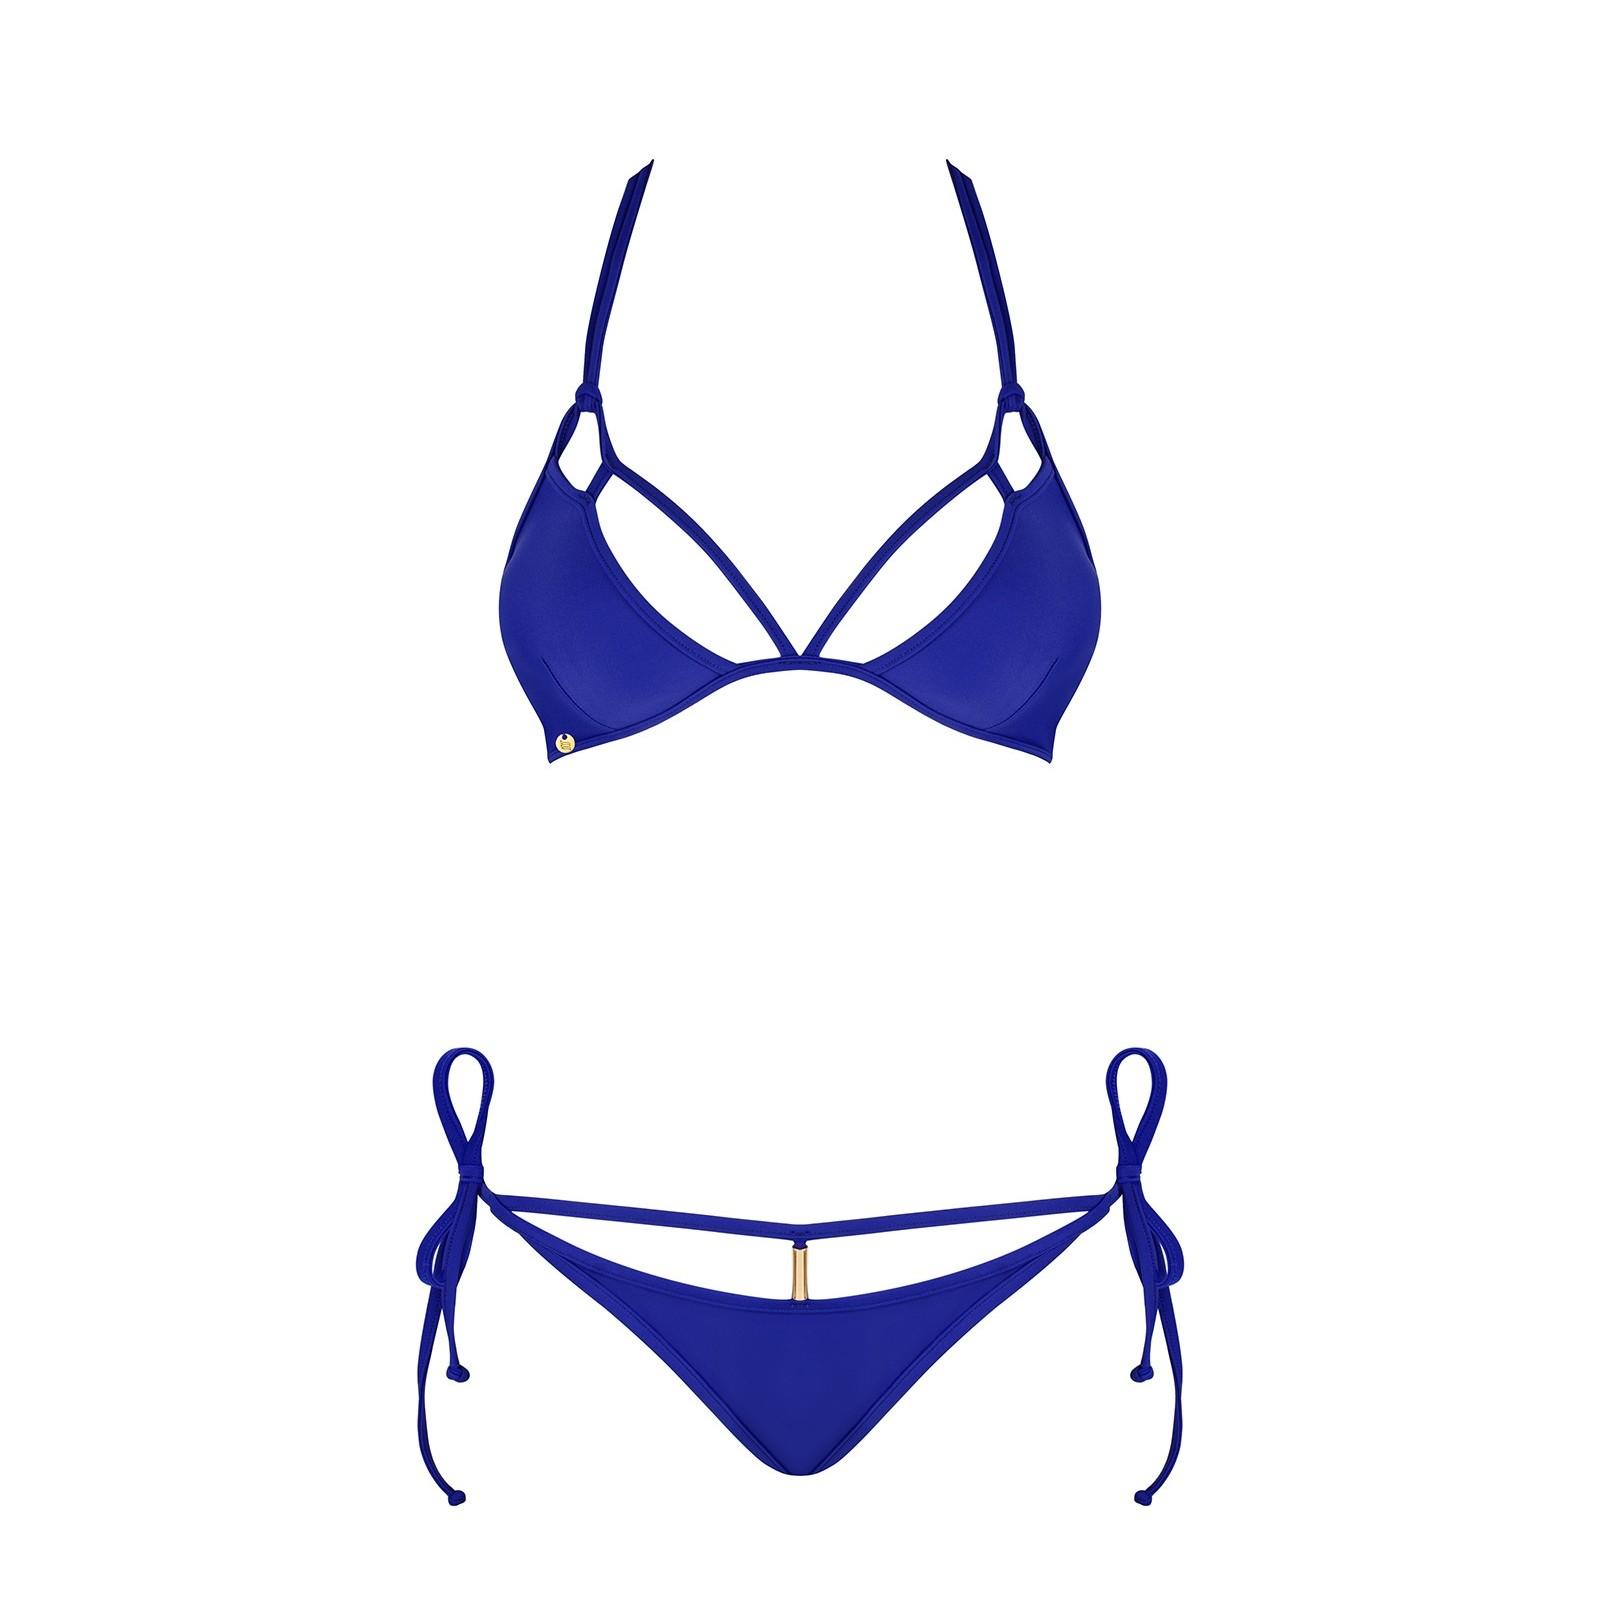 Bikini Costarica blau - 5 - Vorschaubild